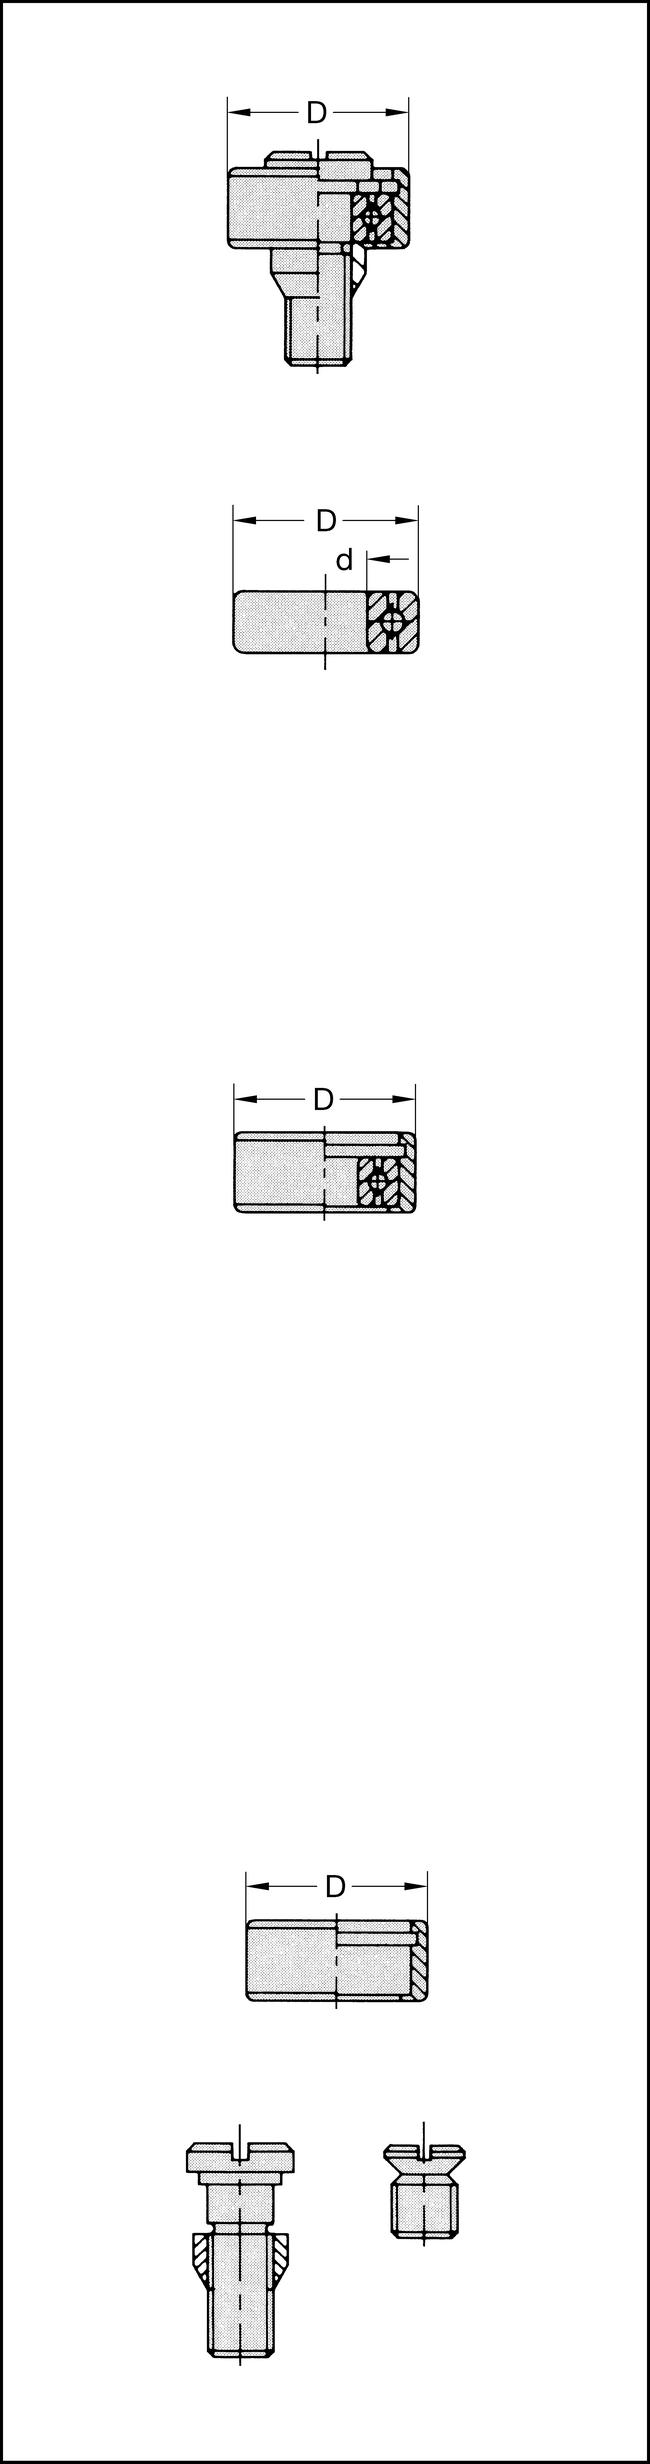 Kugellager 19x6mm / d=6mm